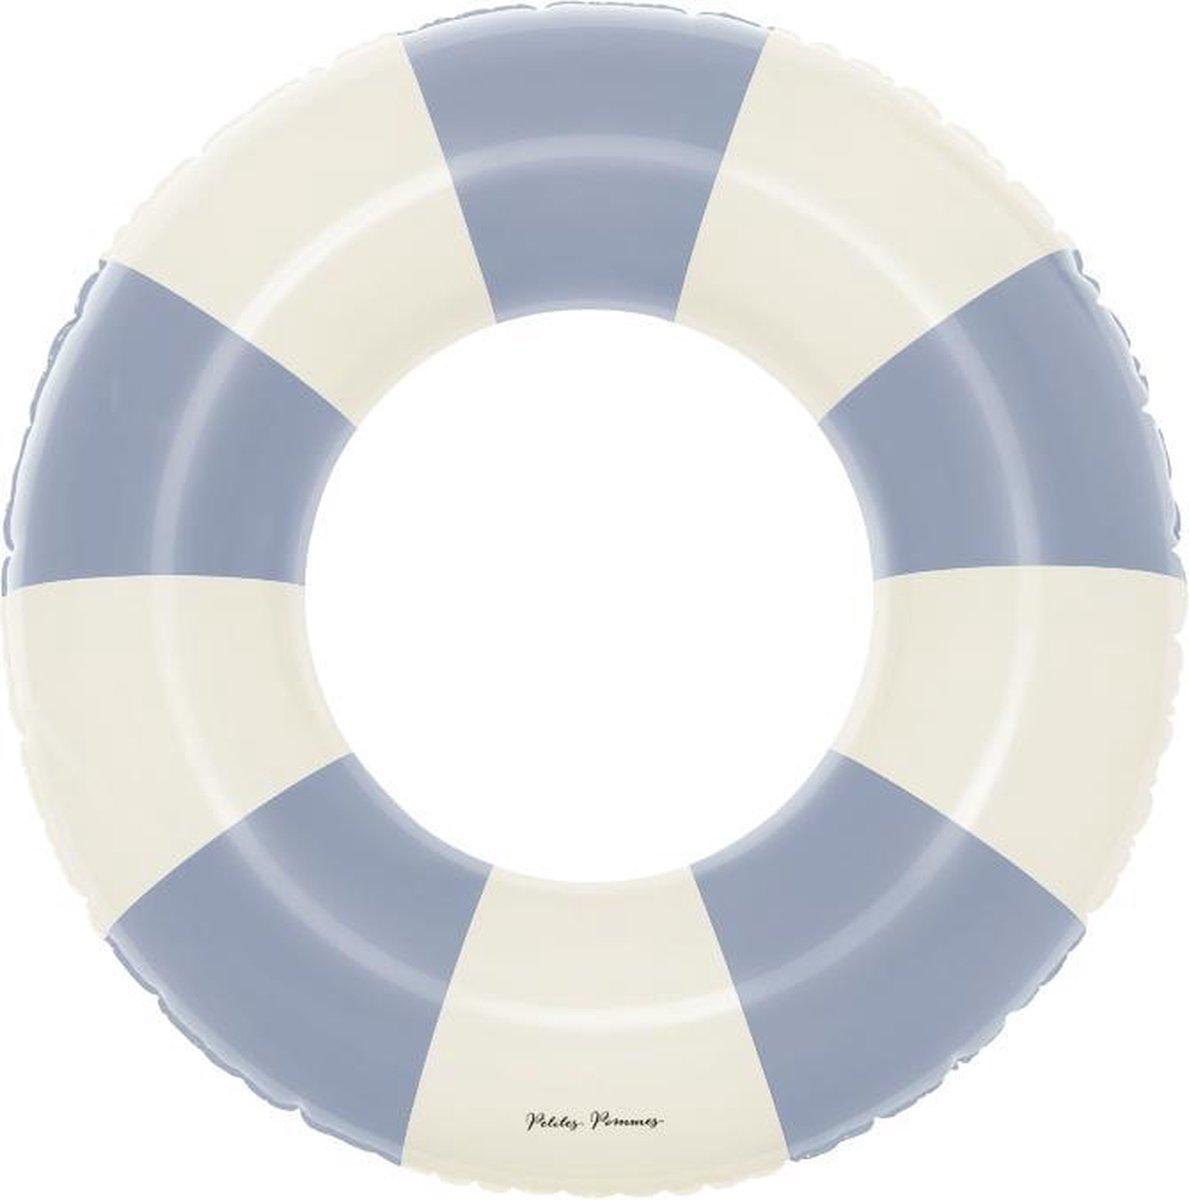 Petites Pommes Zwemring Celine Grand Float Nordic Blue - Zwemband - ø 120cm - 6+ jaar